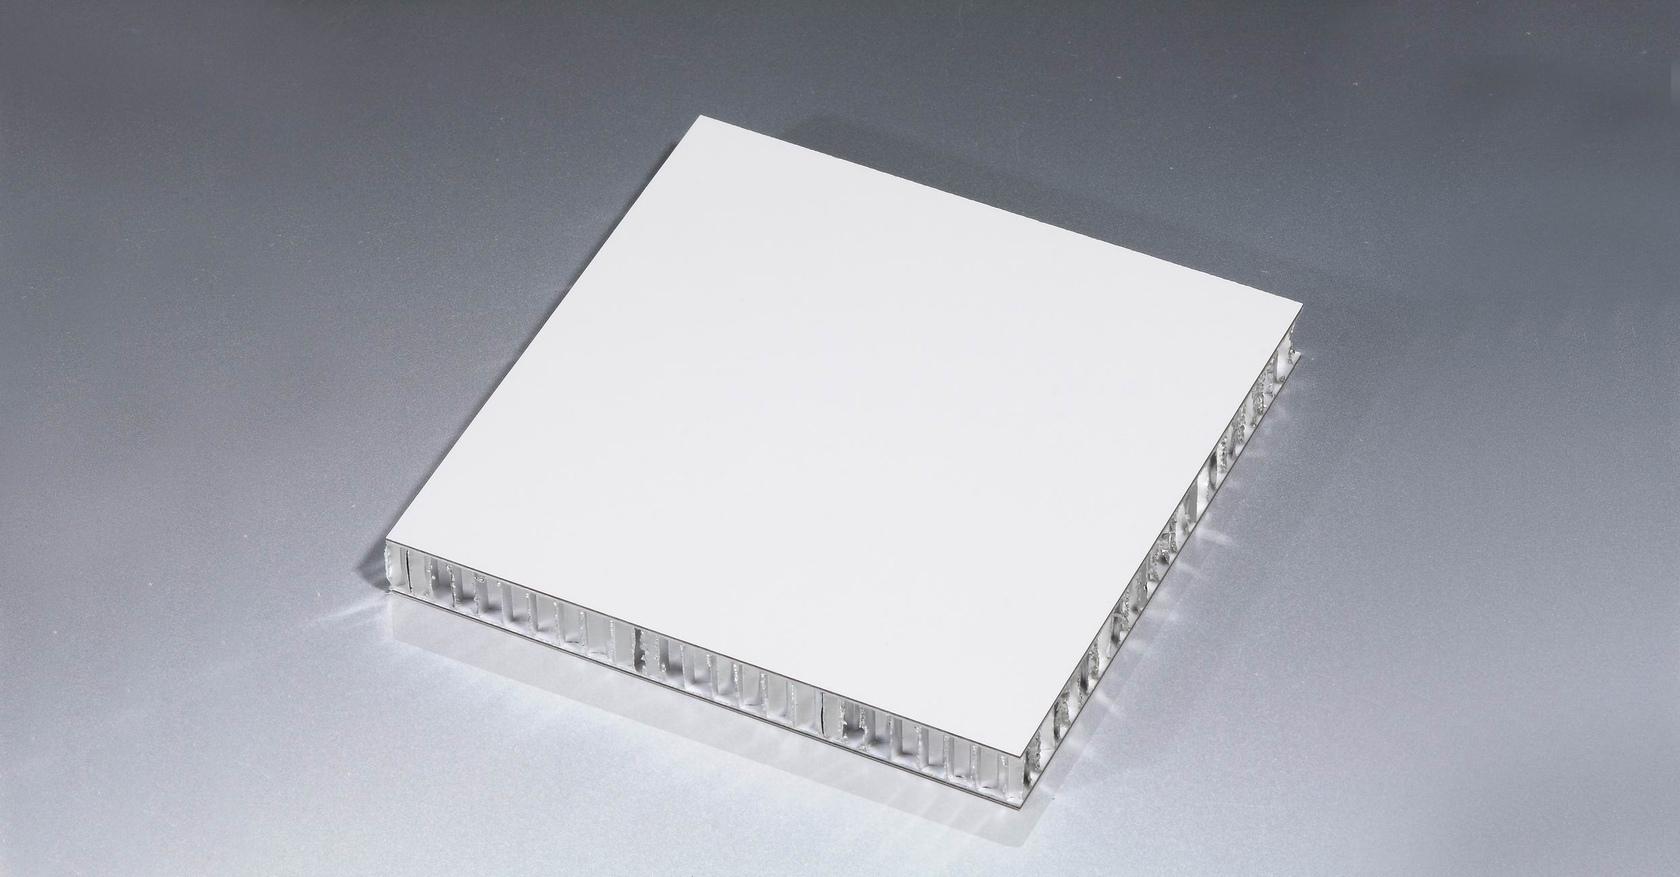 <strong>使用不同胶黏剂不同对隔音铝蜂窝板会有什么影响?</strong>